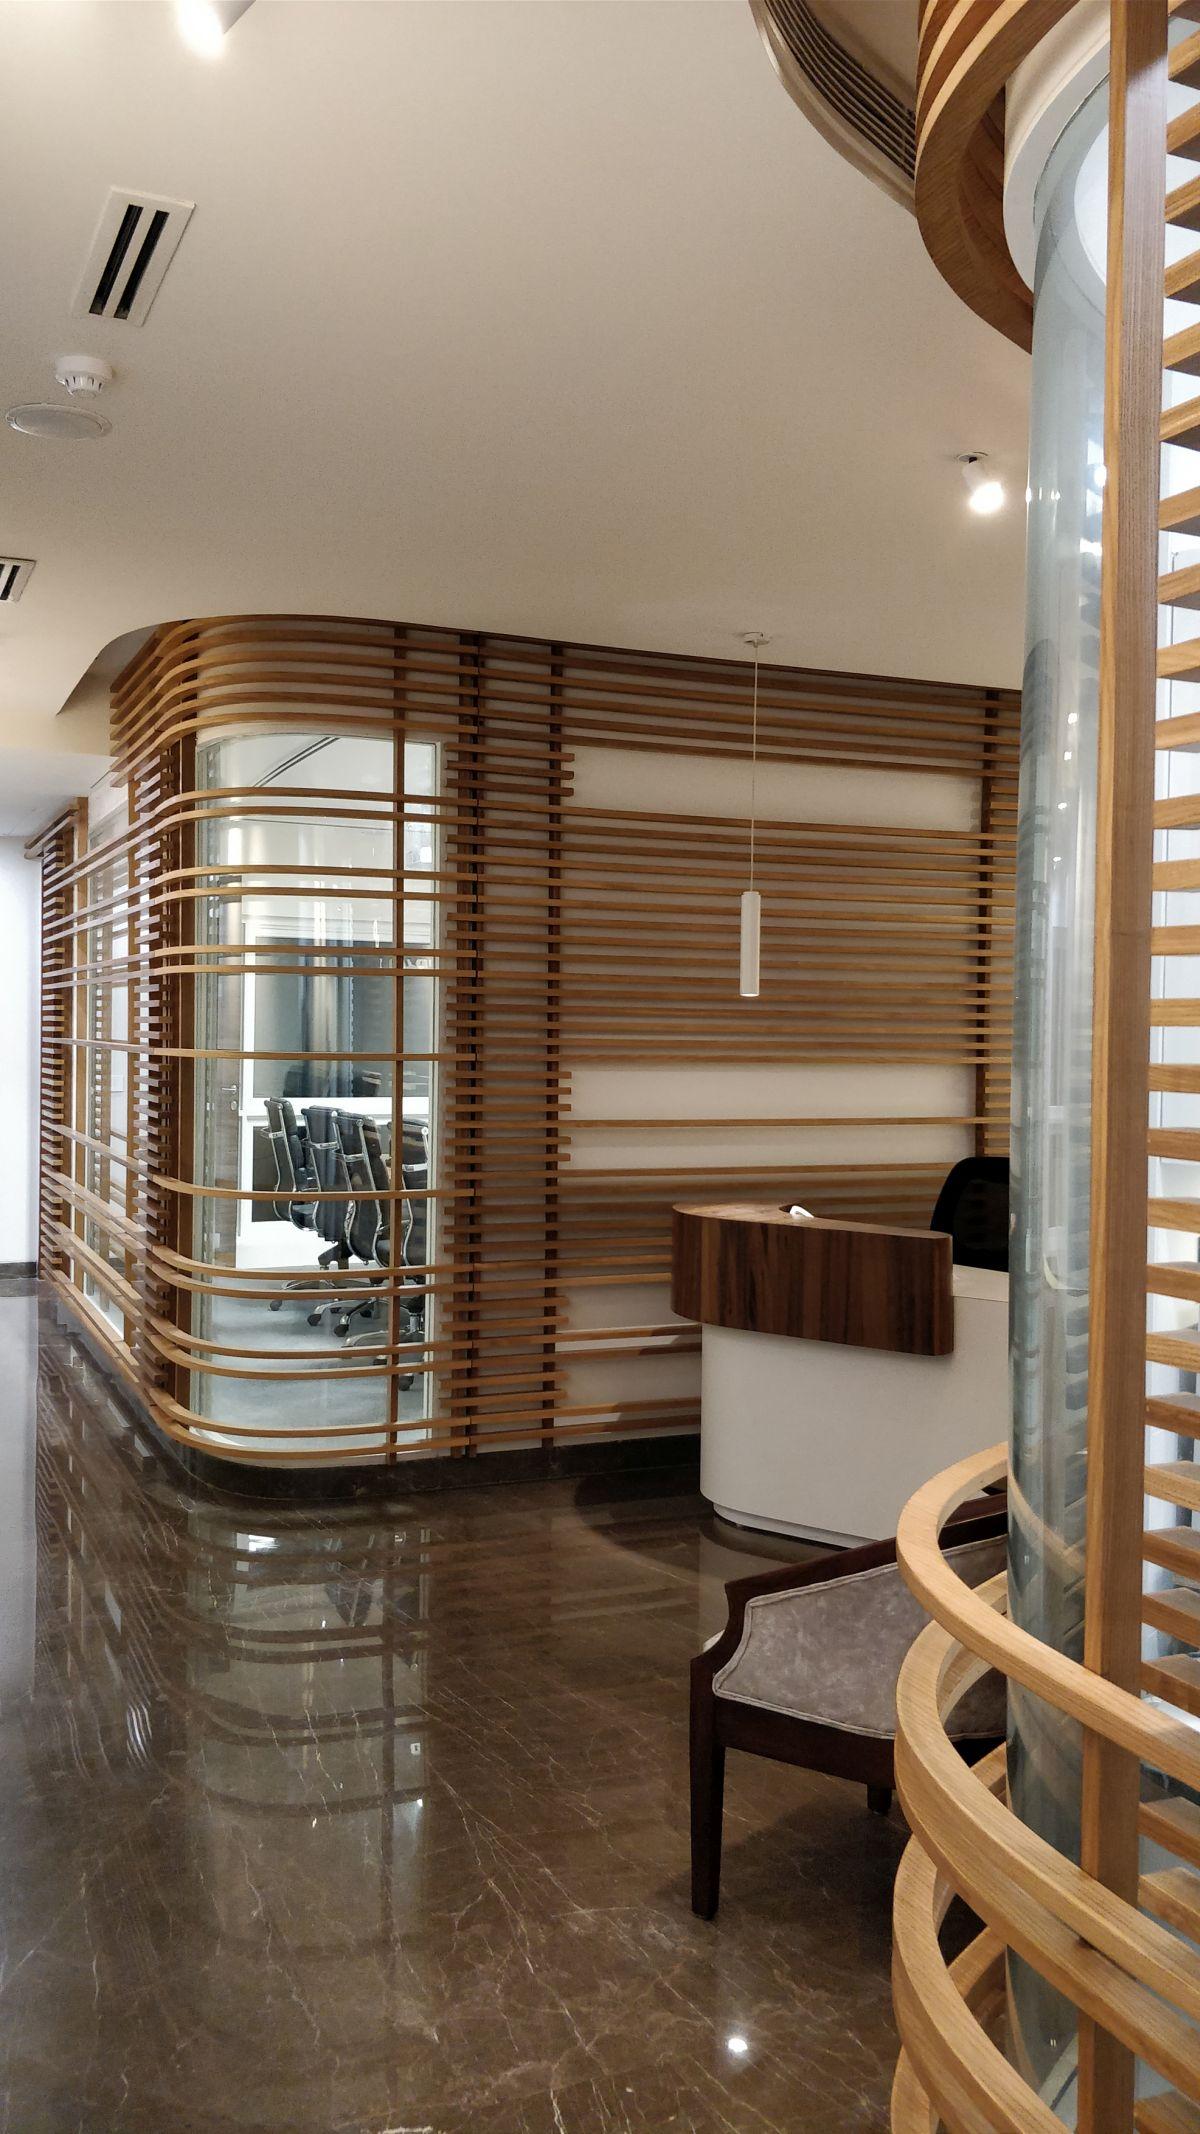 Interior Design: Panalfa Automotives - Head Office at New Delhi by Forum Architecture 21